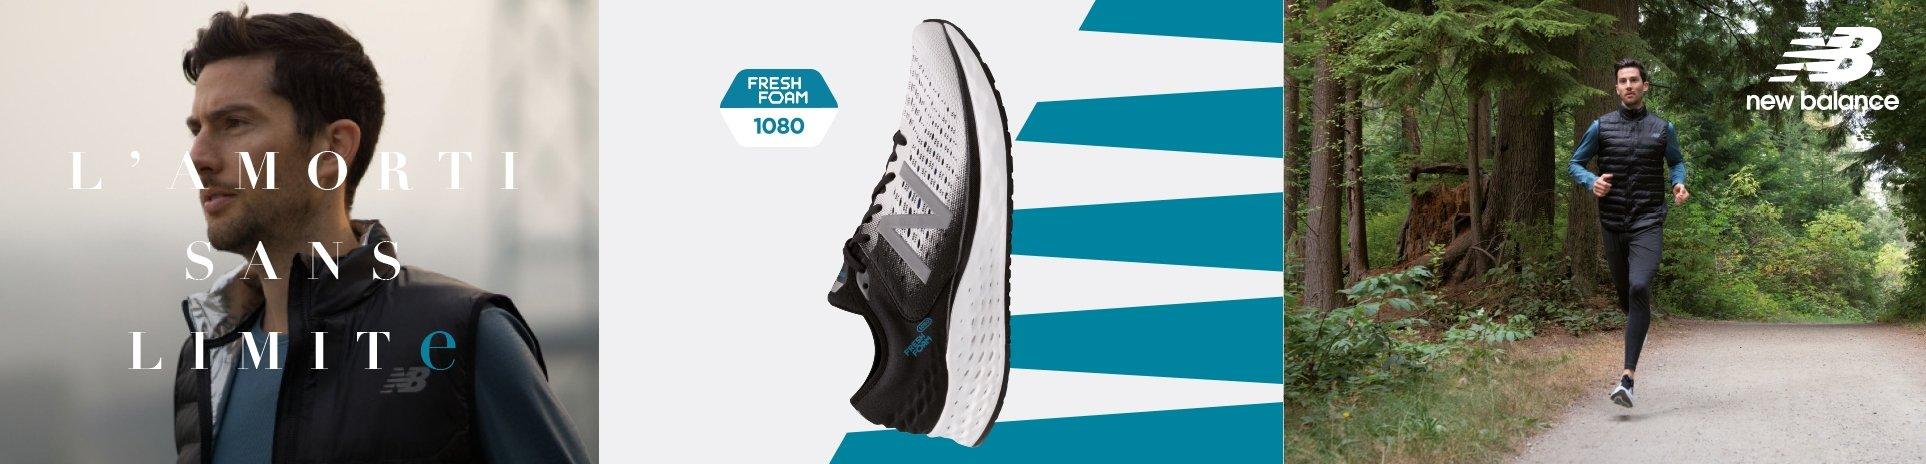 New Balance Fresh Foam 1080v9 homme